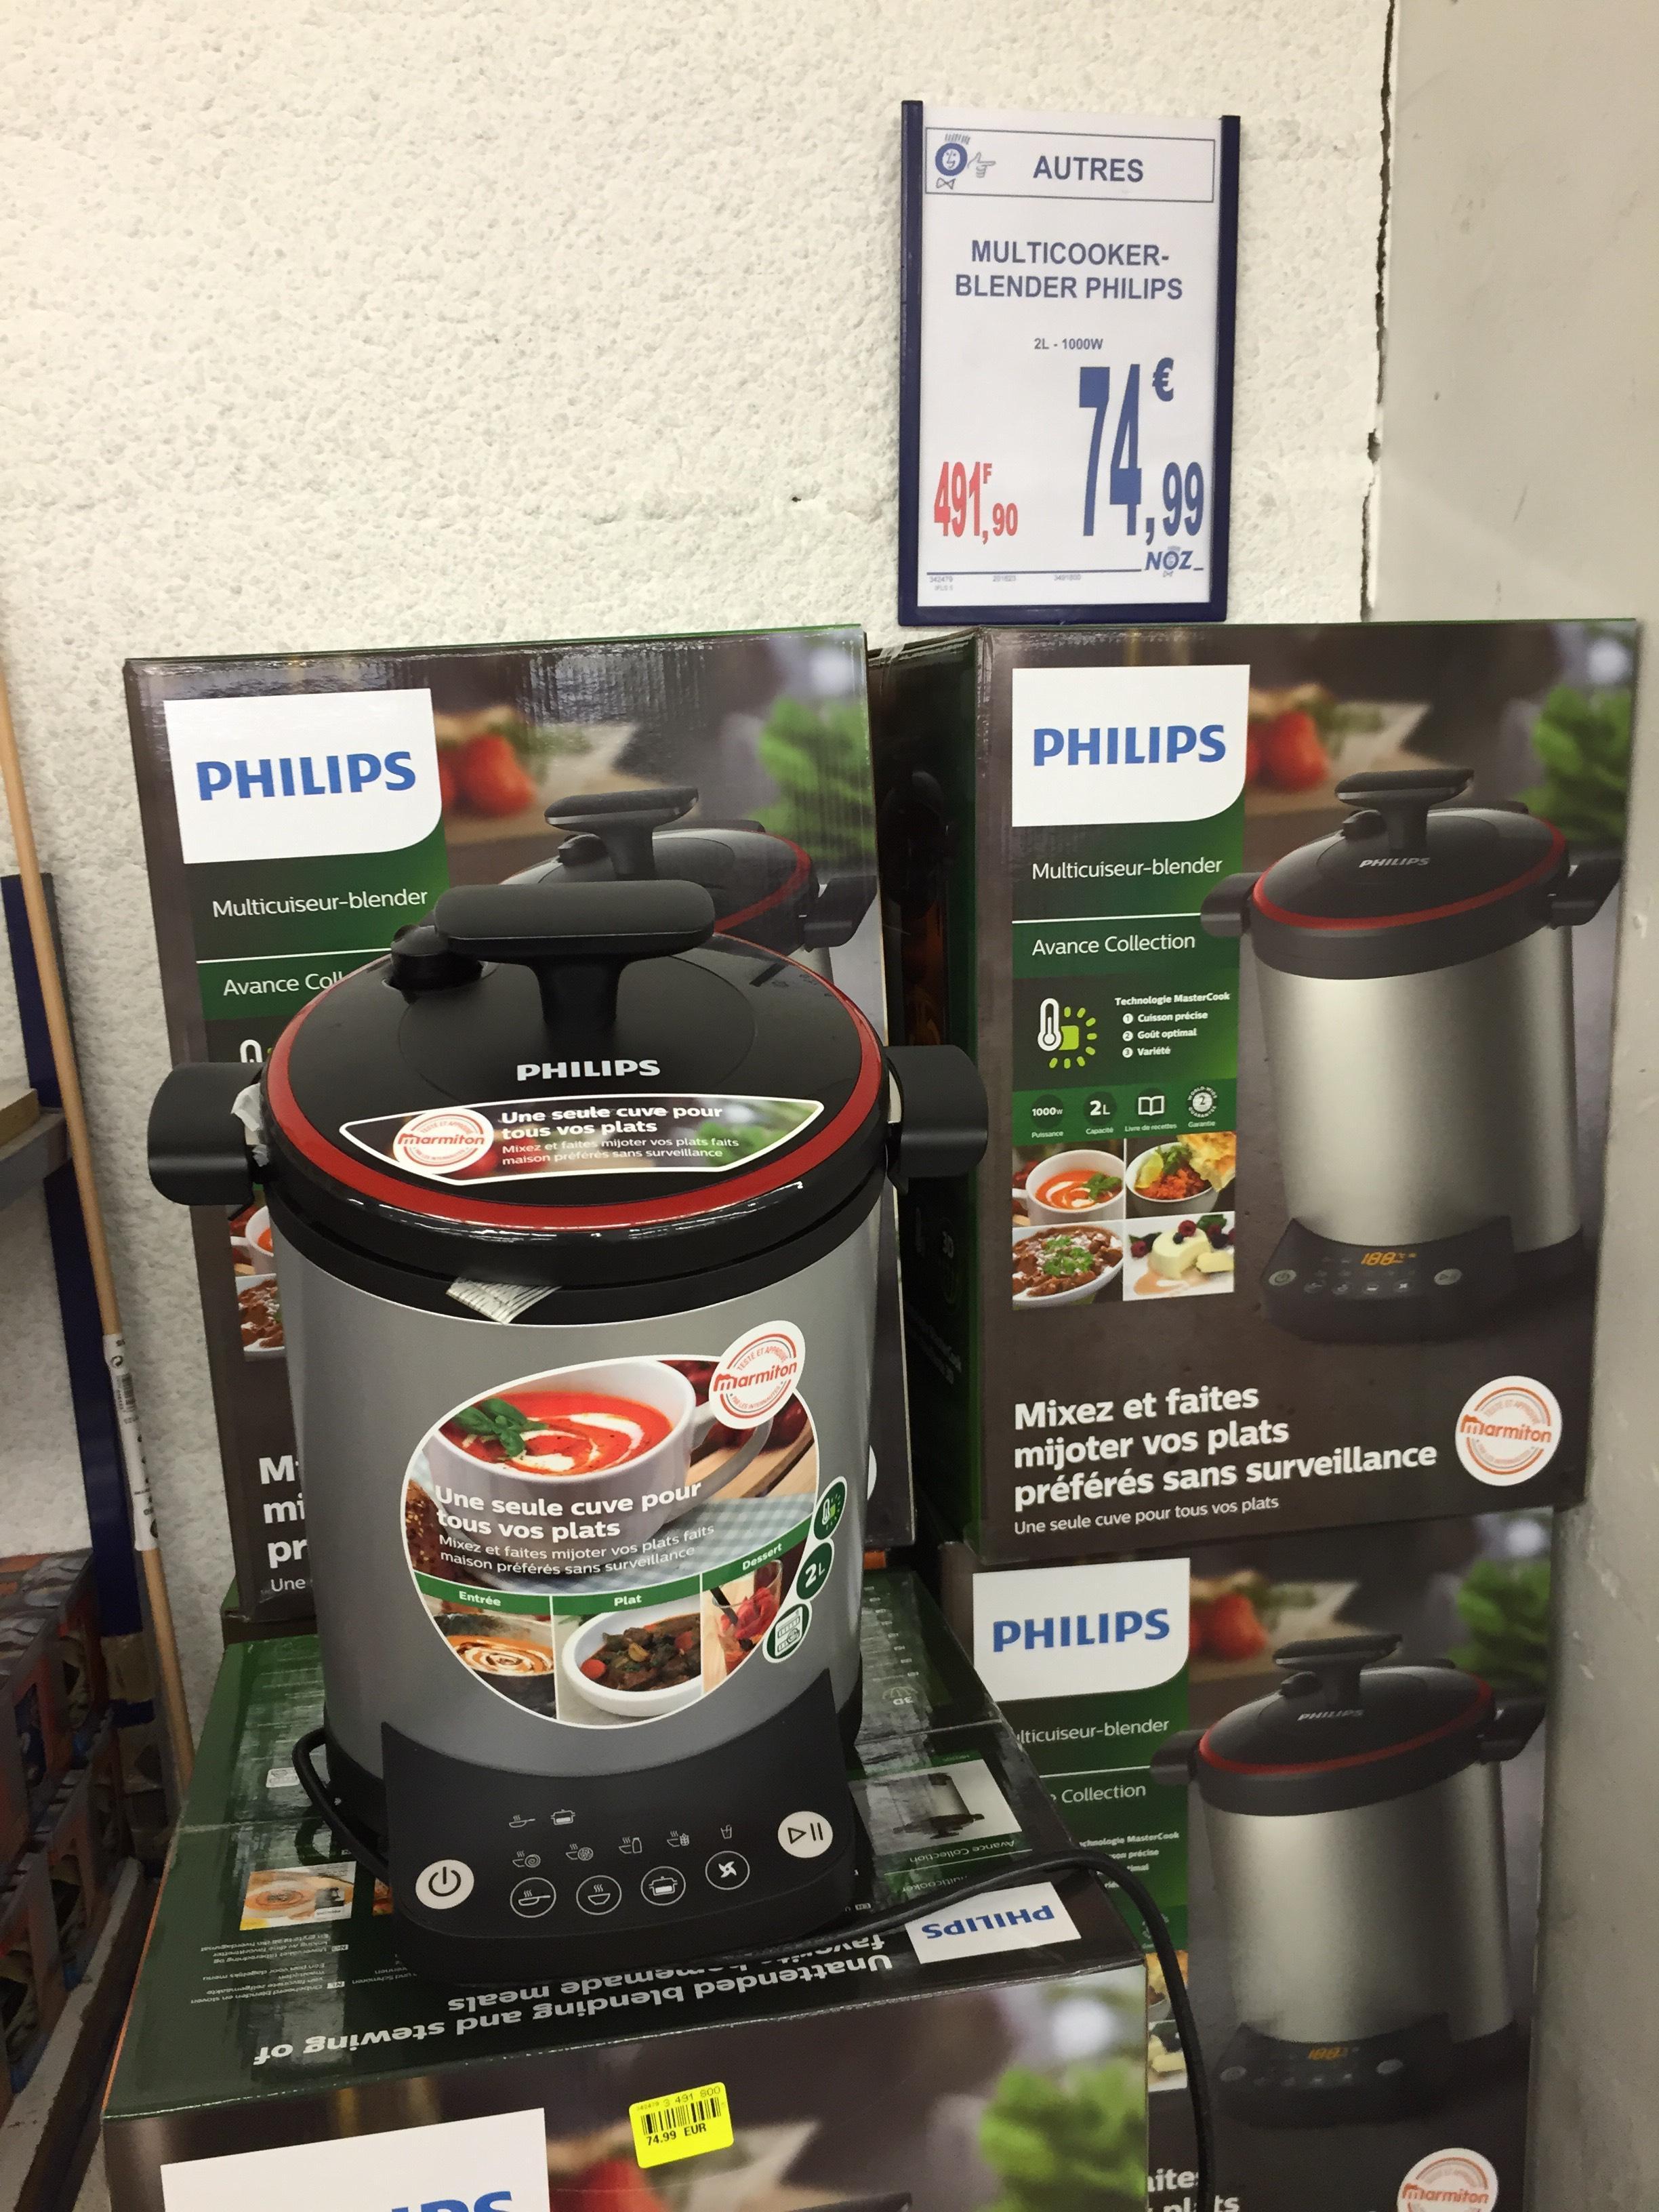 Multicuiseur Blender Philips HR2205/HR2206 (via ODR de 40€)